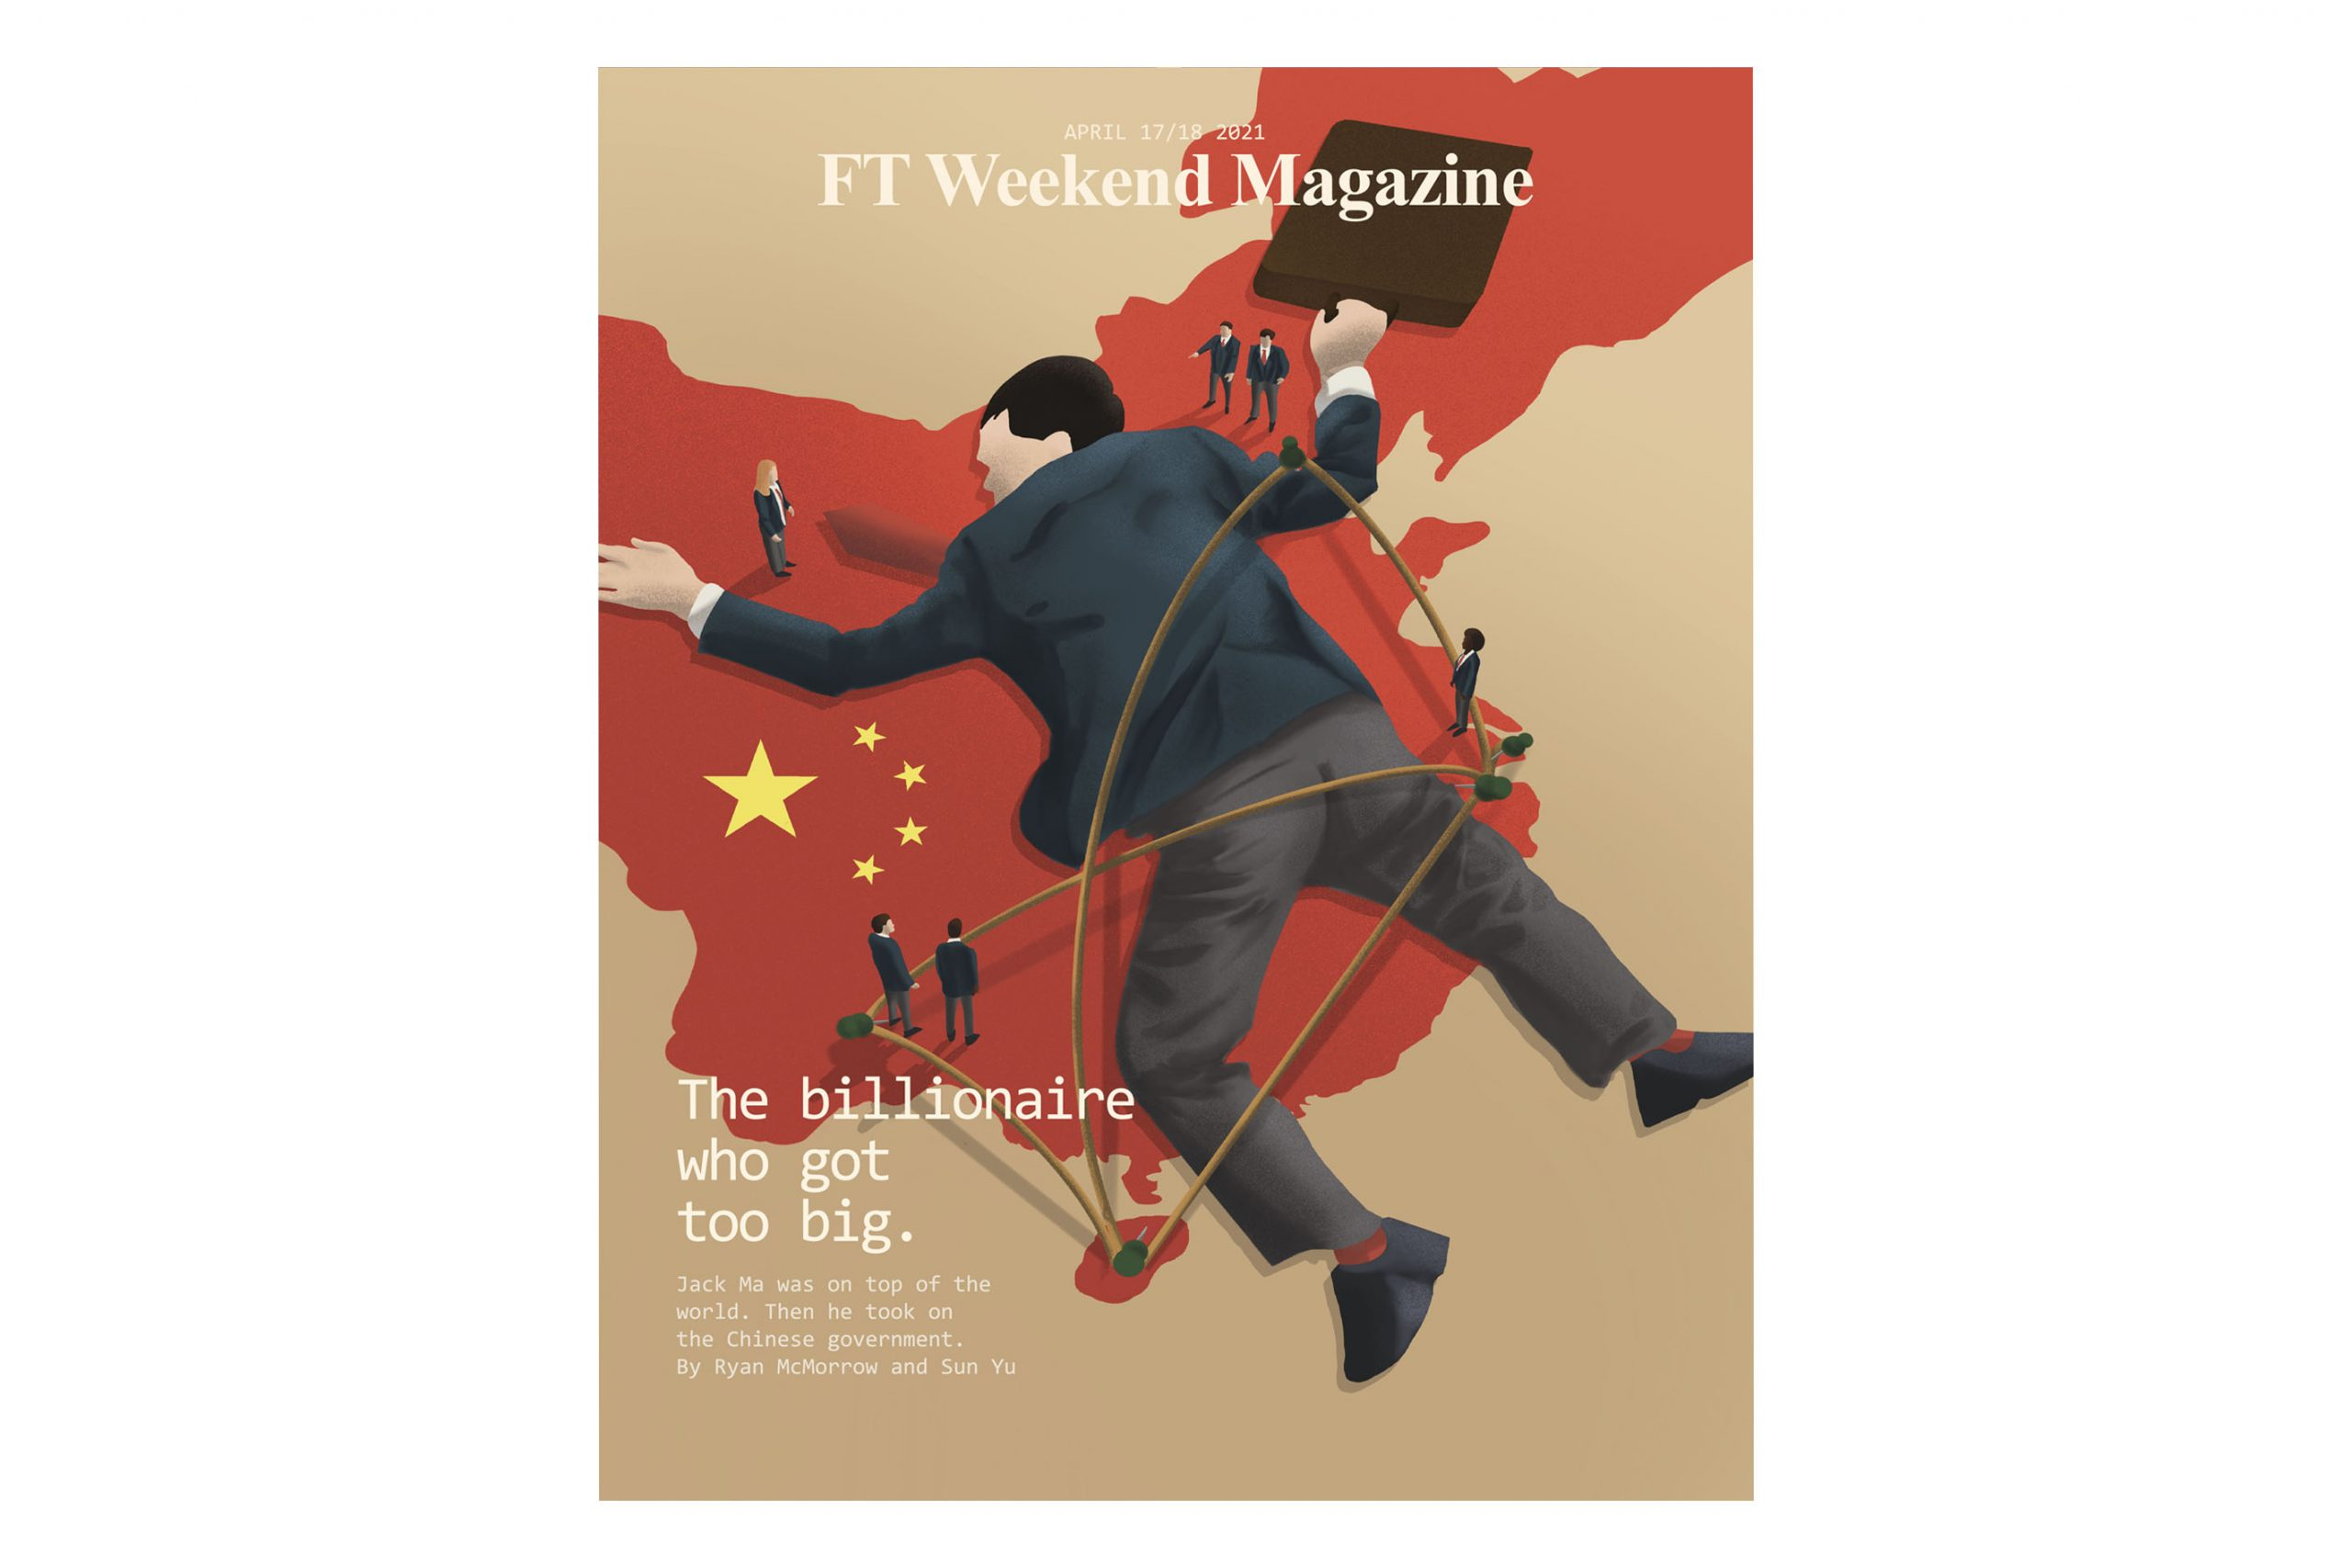 Ewan Joseph White Speculative FT Cover The Billionaire Who Got Too Big Illustration.jpg